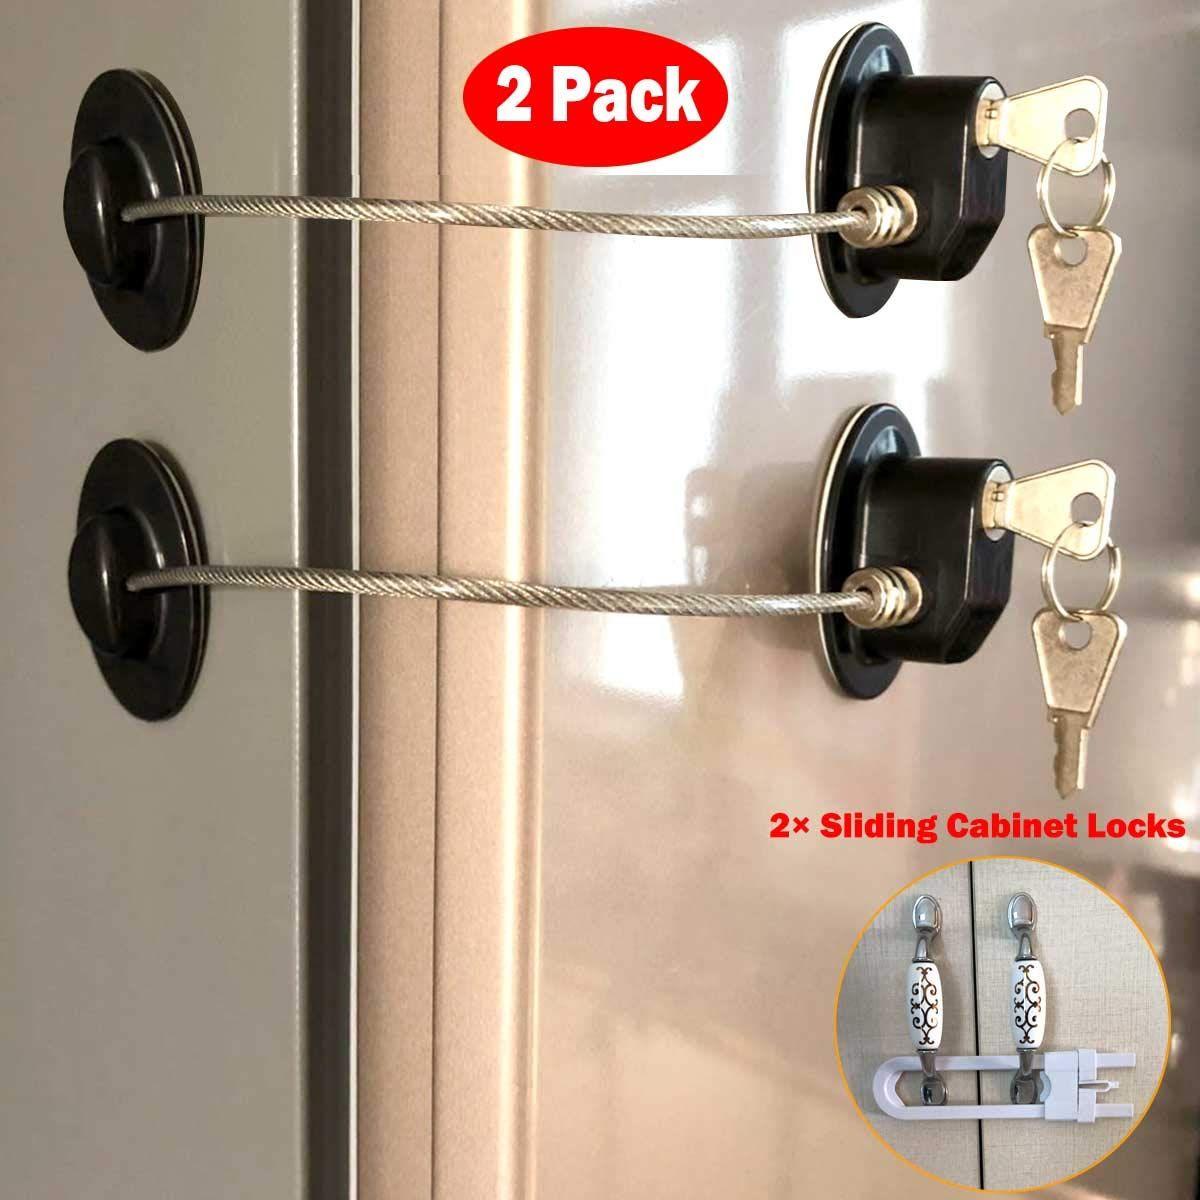 Refrigerator Door Locks 2 Pack Black Mini Fridge Lock File Cabinet Lock Drawer Lock Lock For Cabinet Child Saf Cabinet Locks Fridge Lock Black Mini Fridge